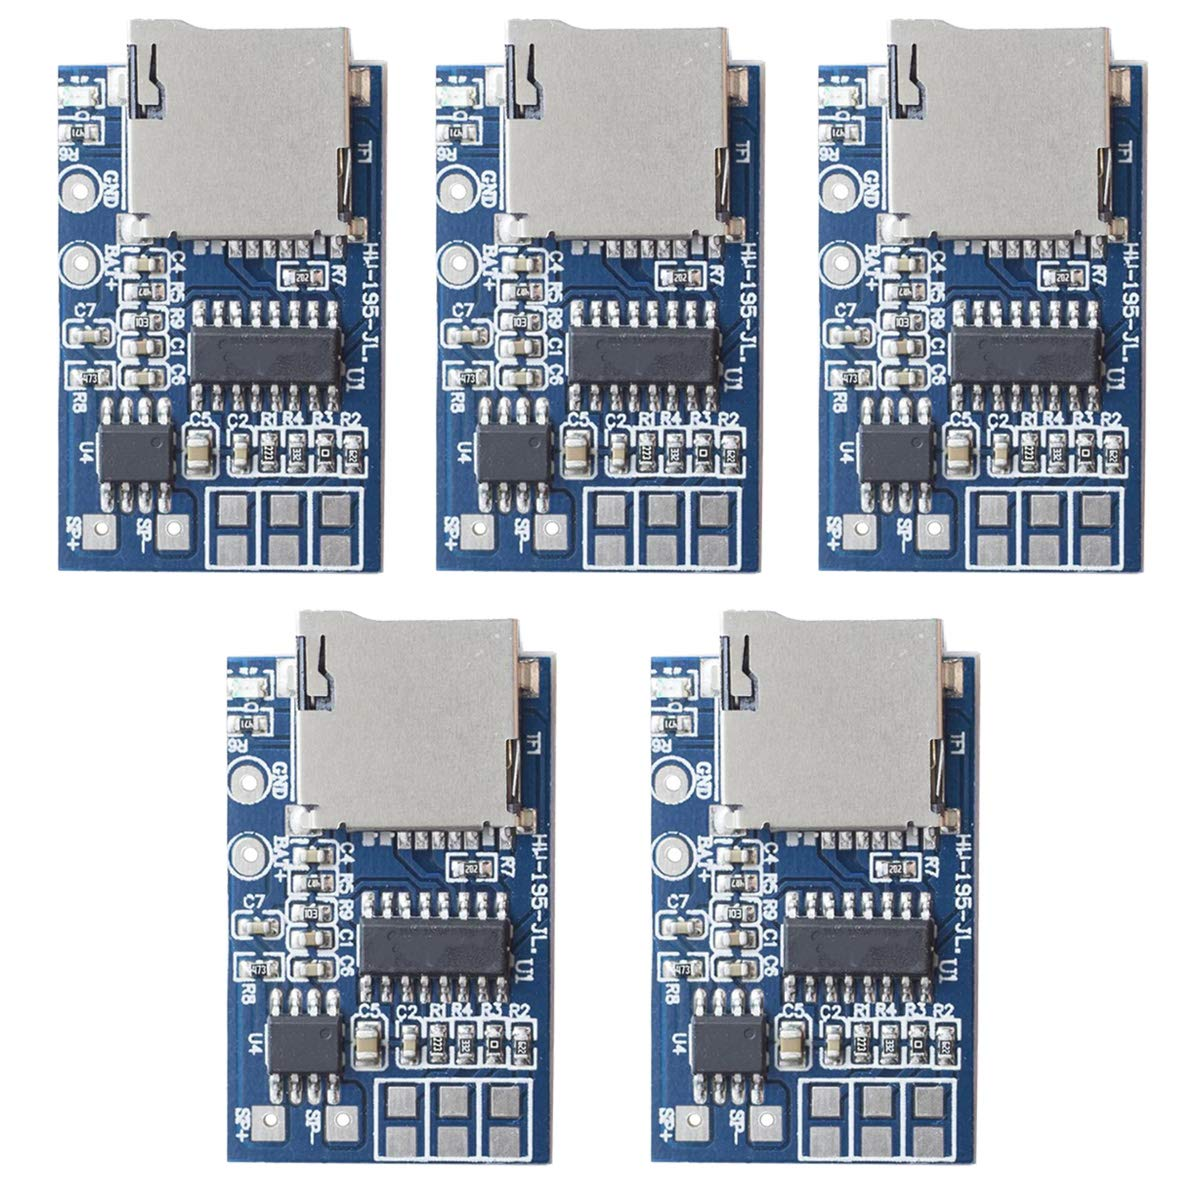 DAOKI5PCS GPD2846A TF 카드 MP3 디코더 보드 2W 앰프 모듈 3.7V | 5V 전원 지원 FM 라디오 오디오 모드